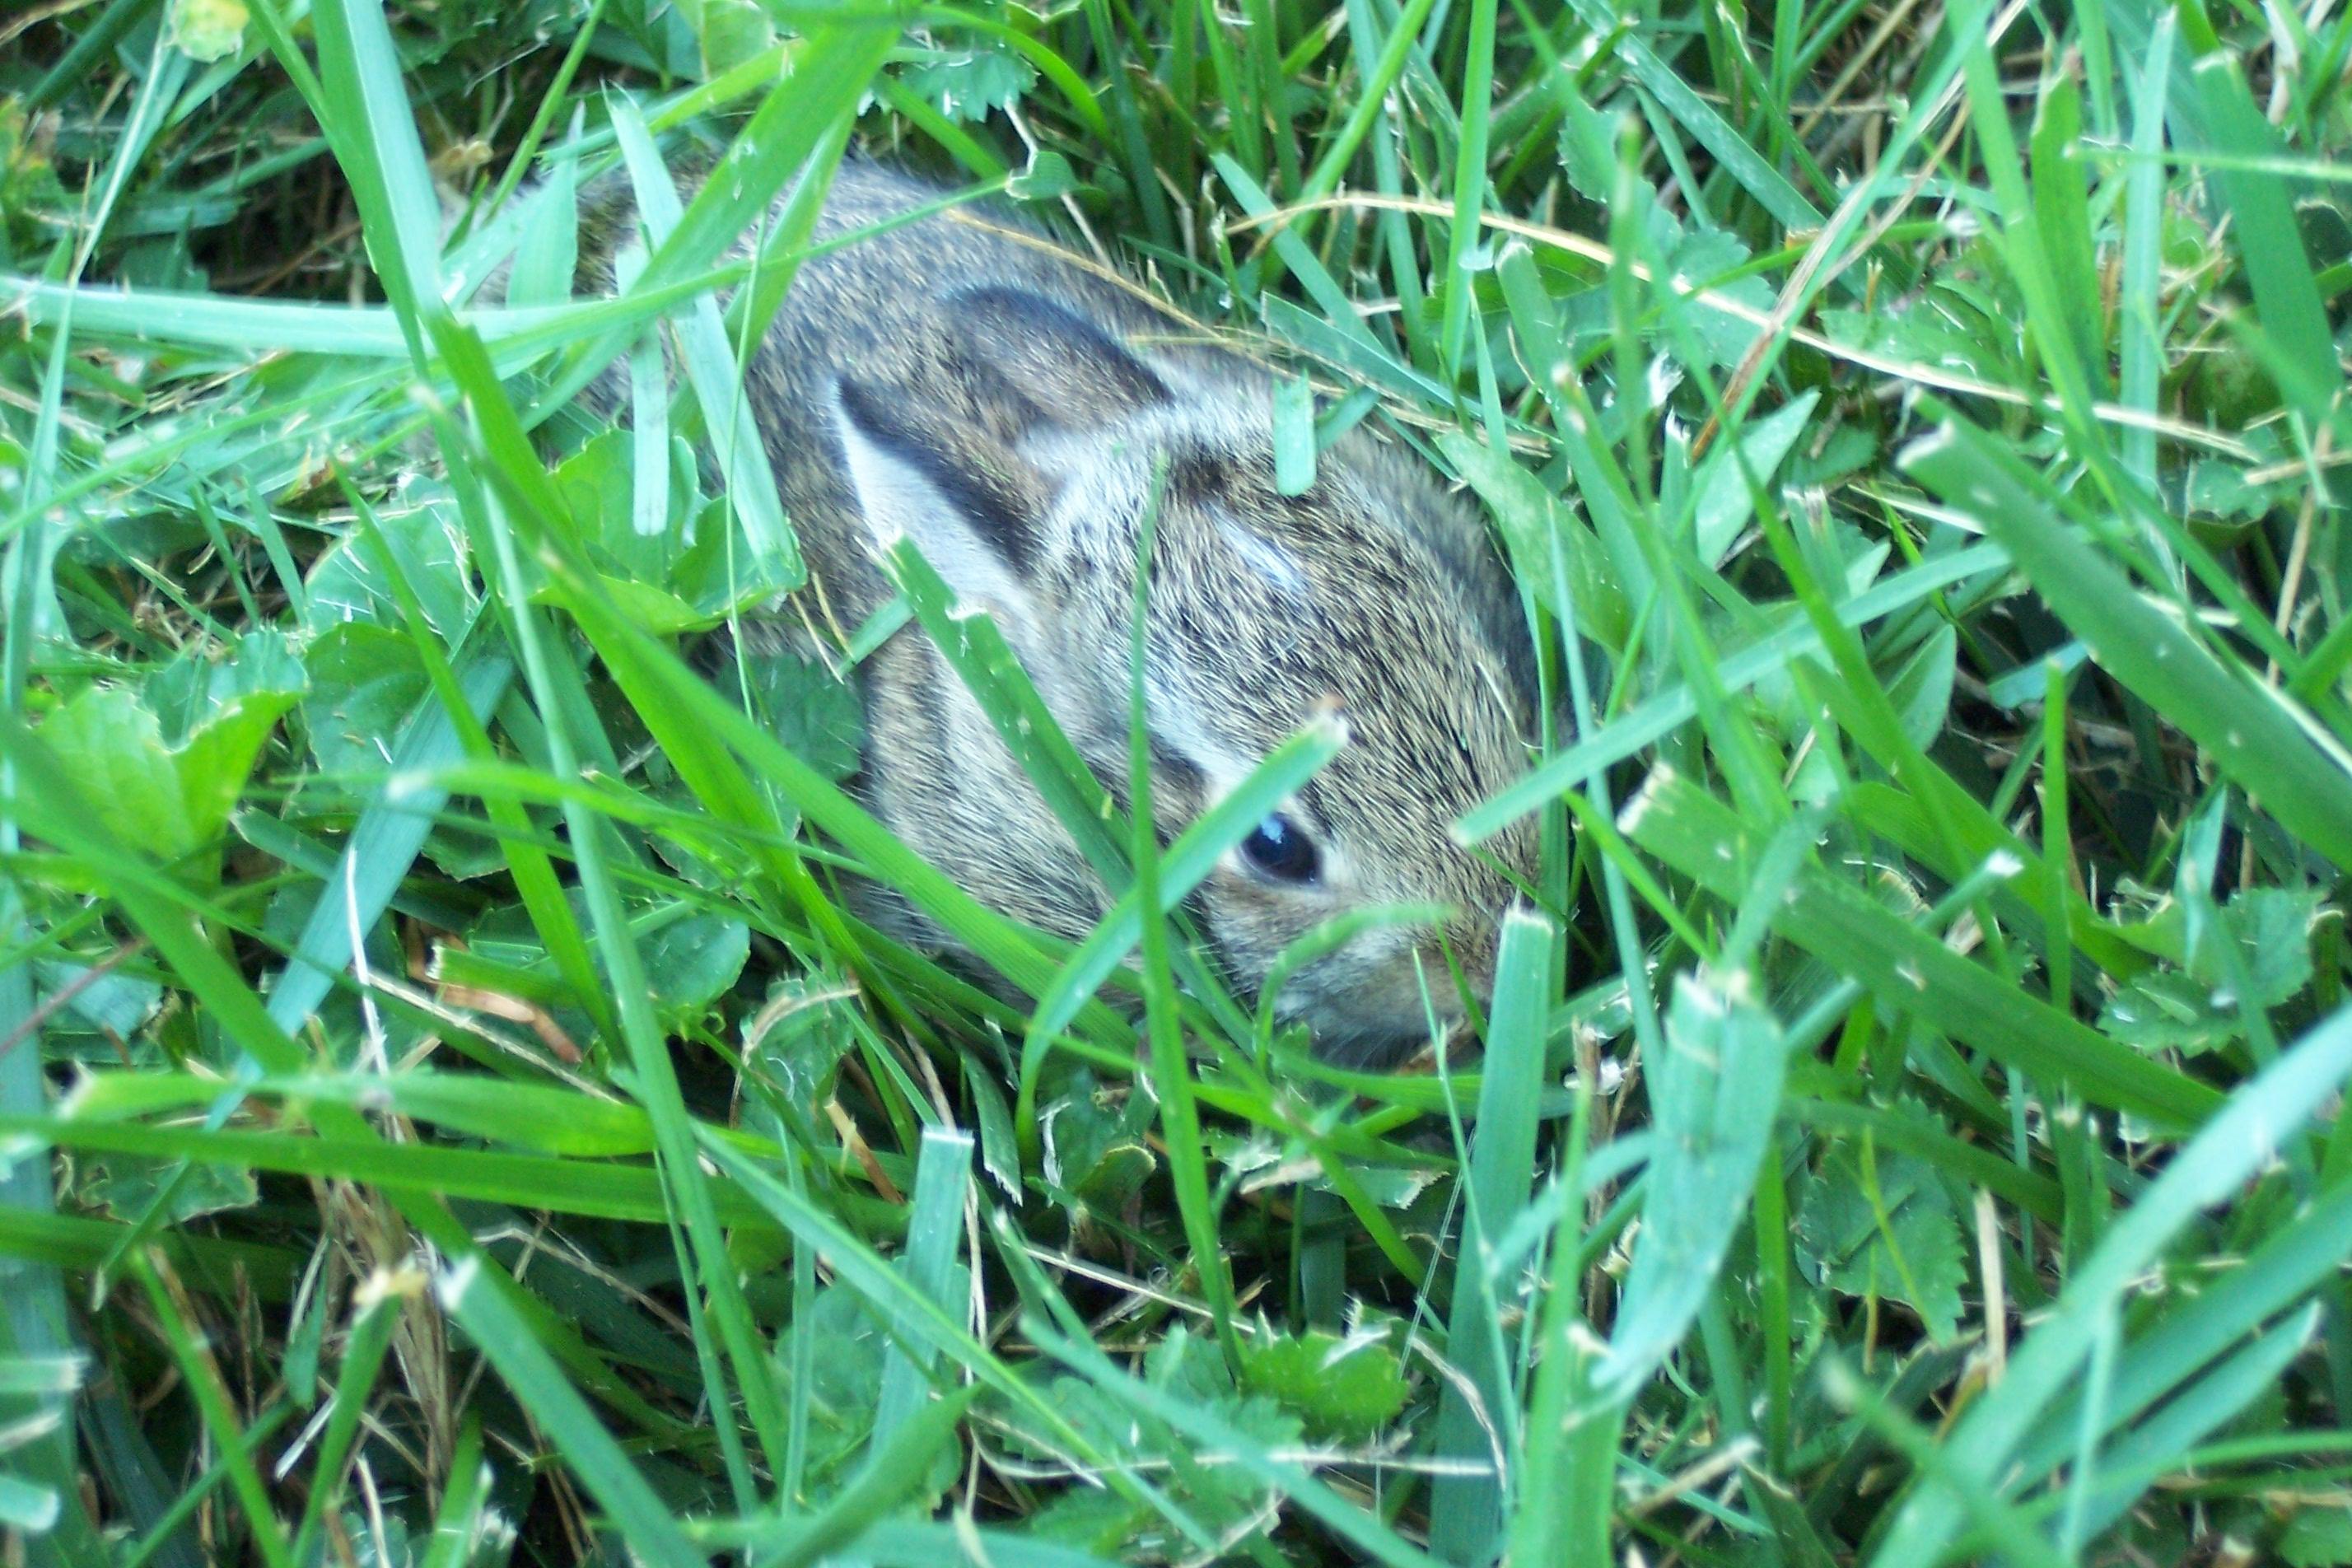 On Yard Work and Baby Bunnies